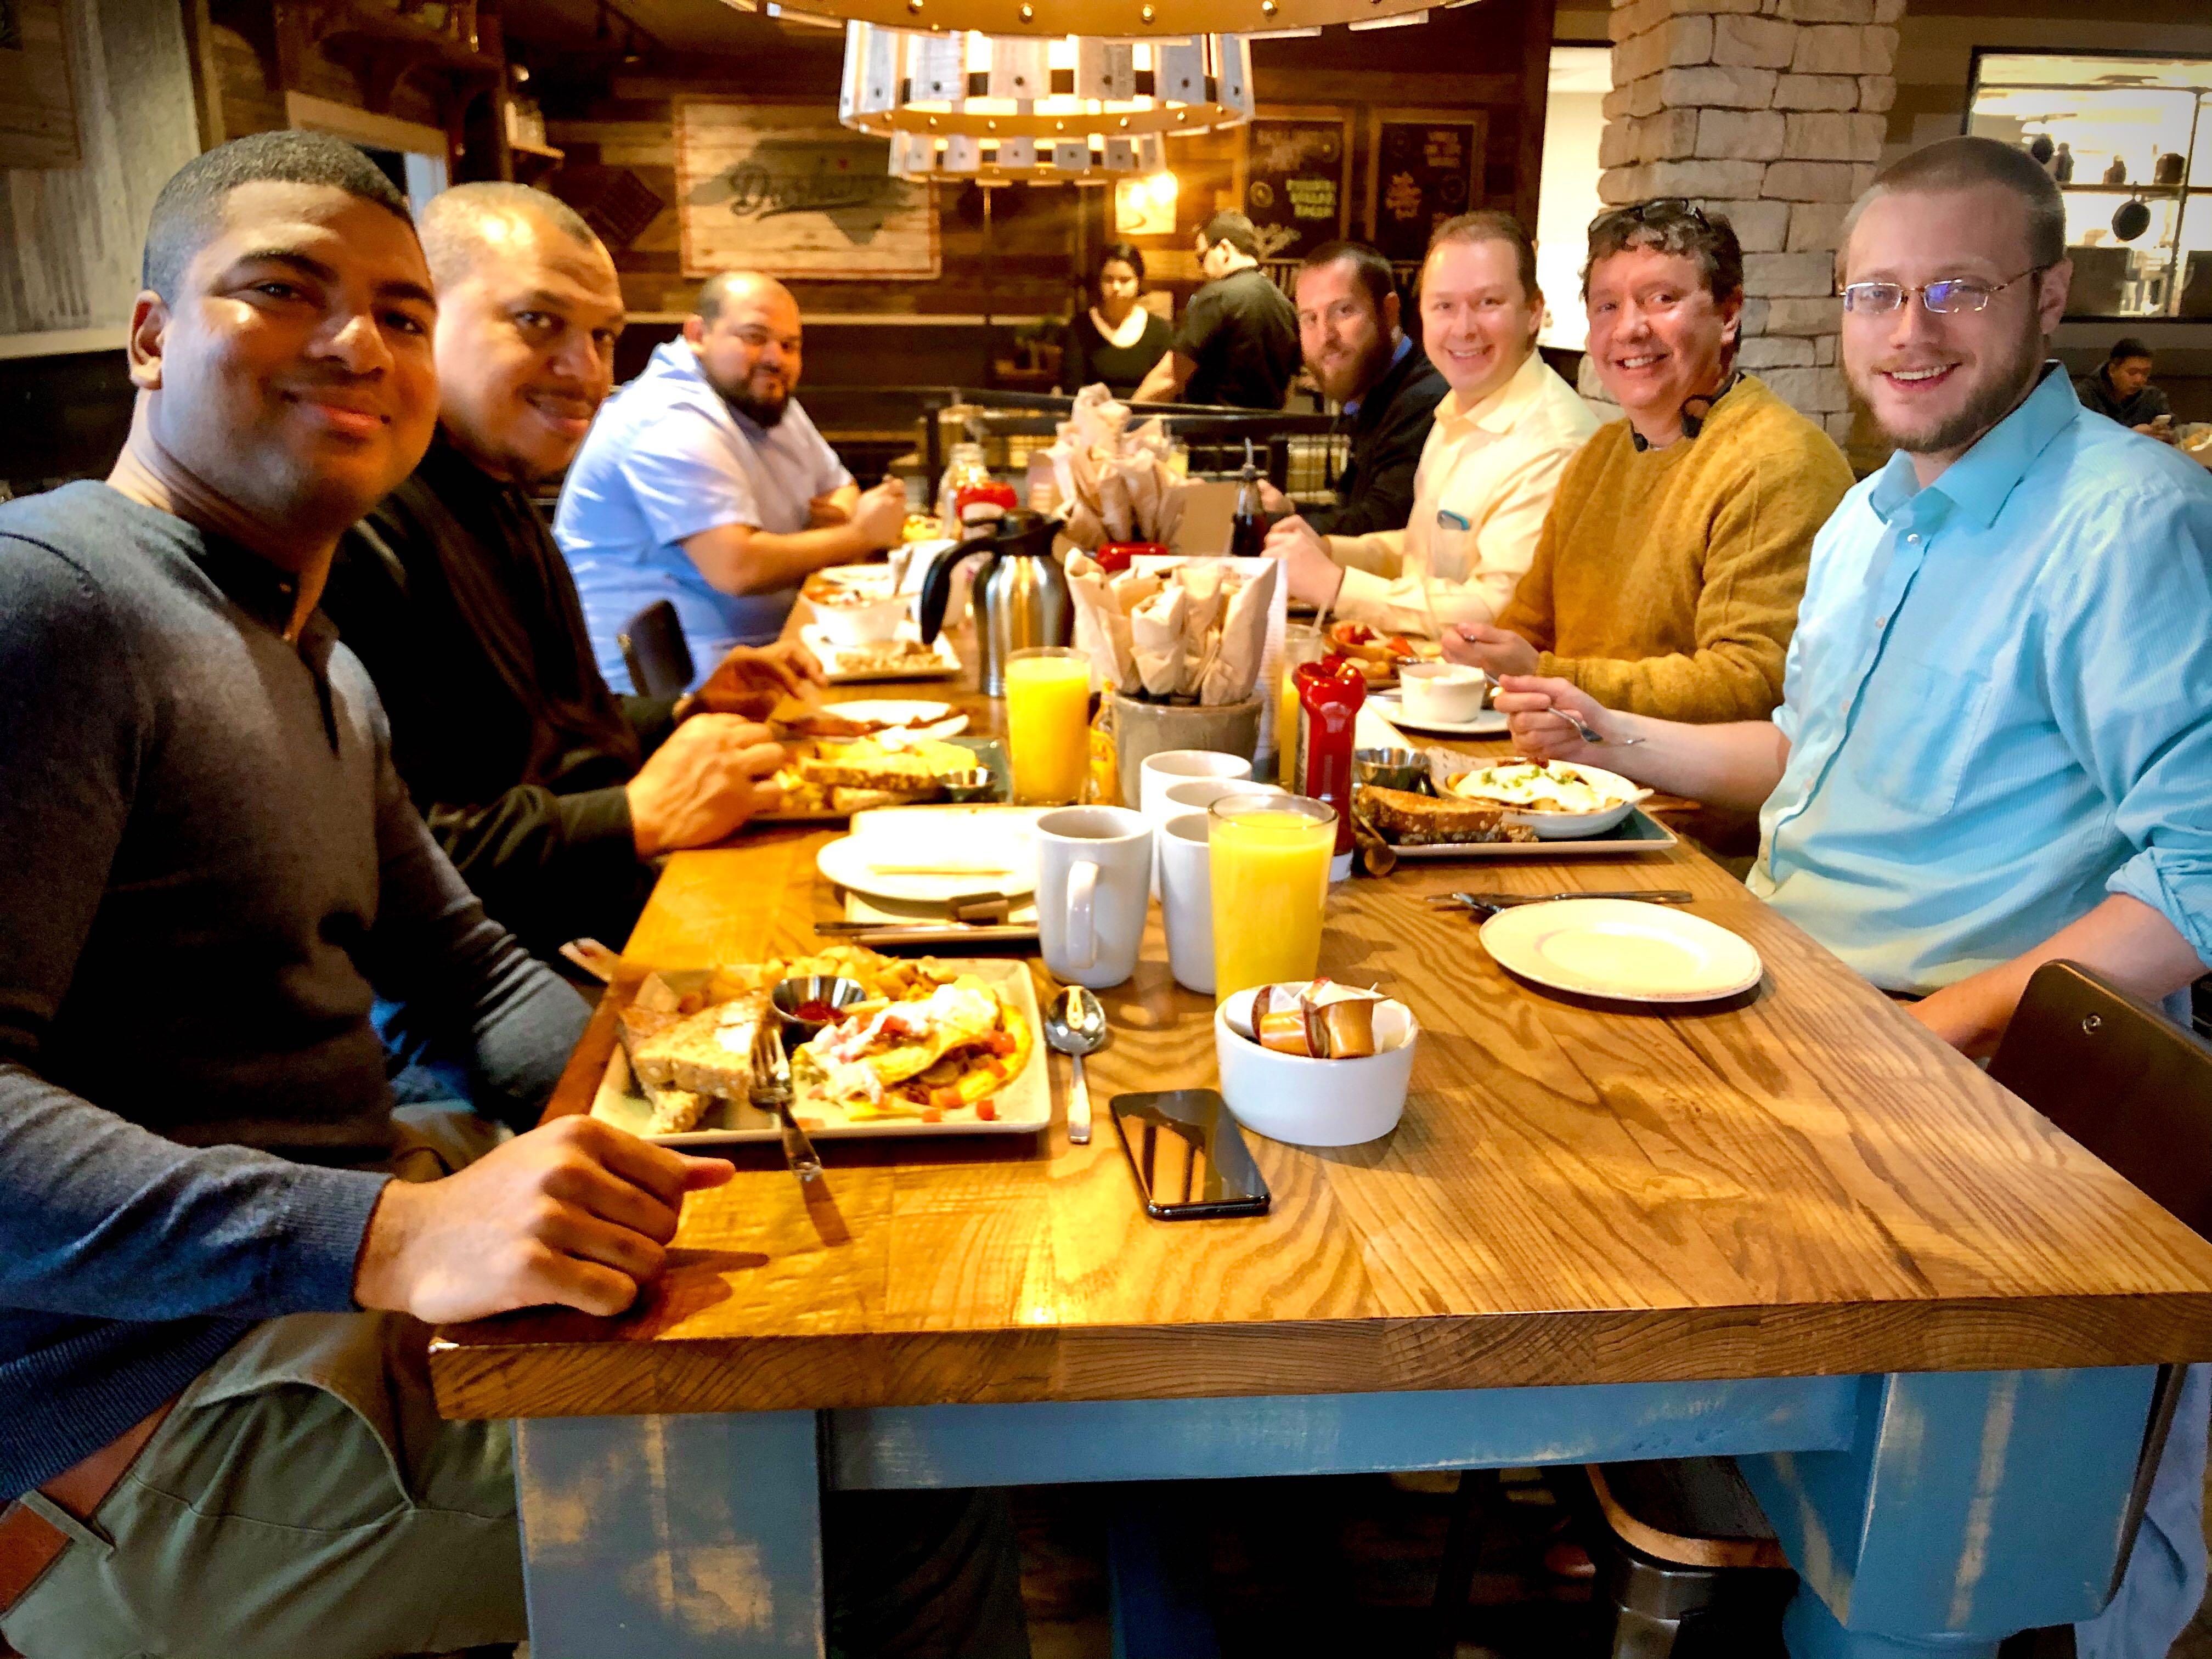 Net Friends managed IT support team having a team breakfast